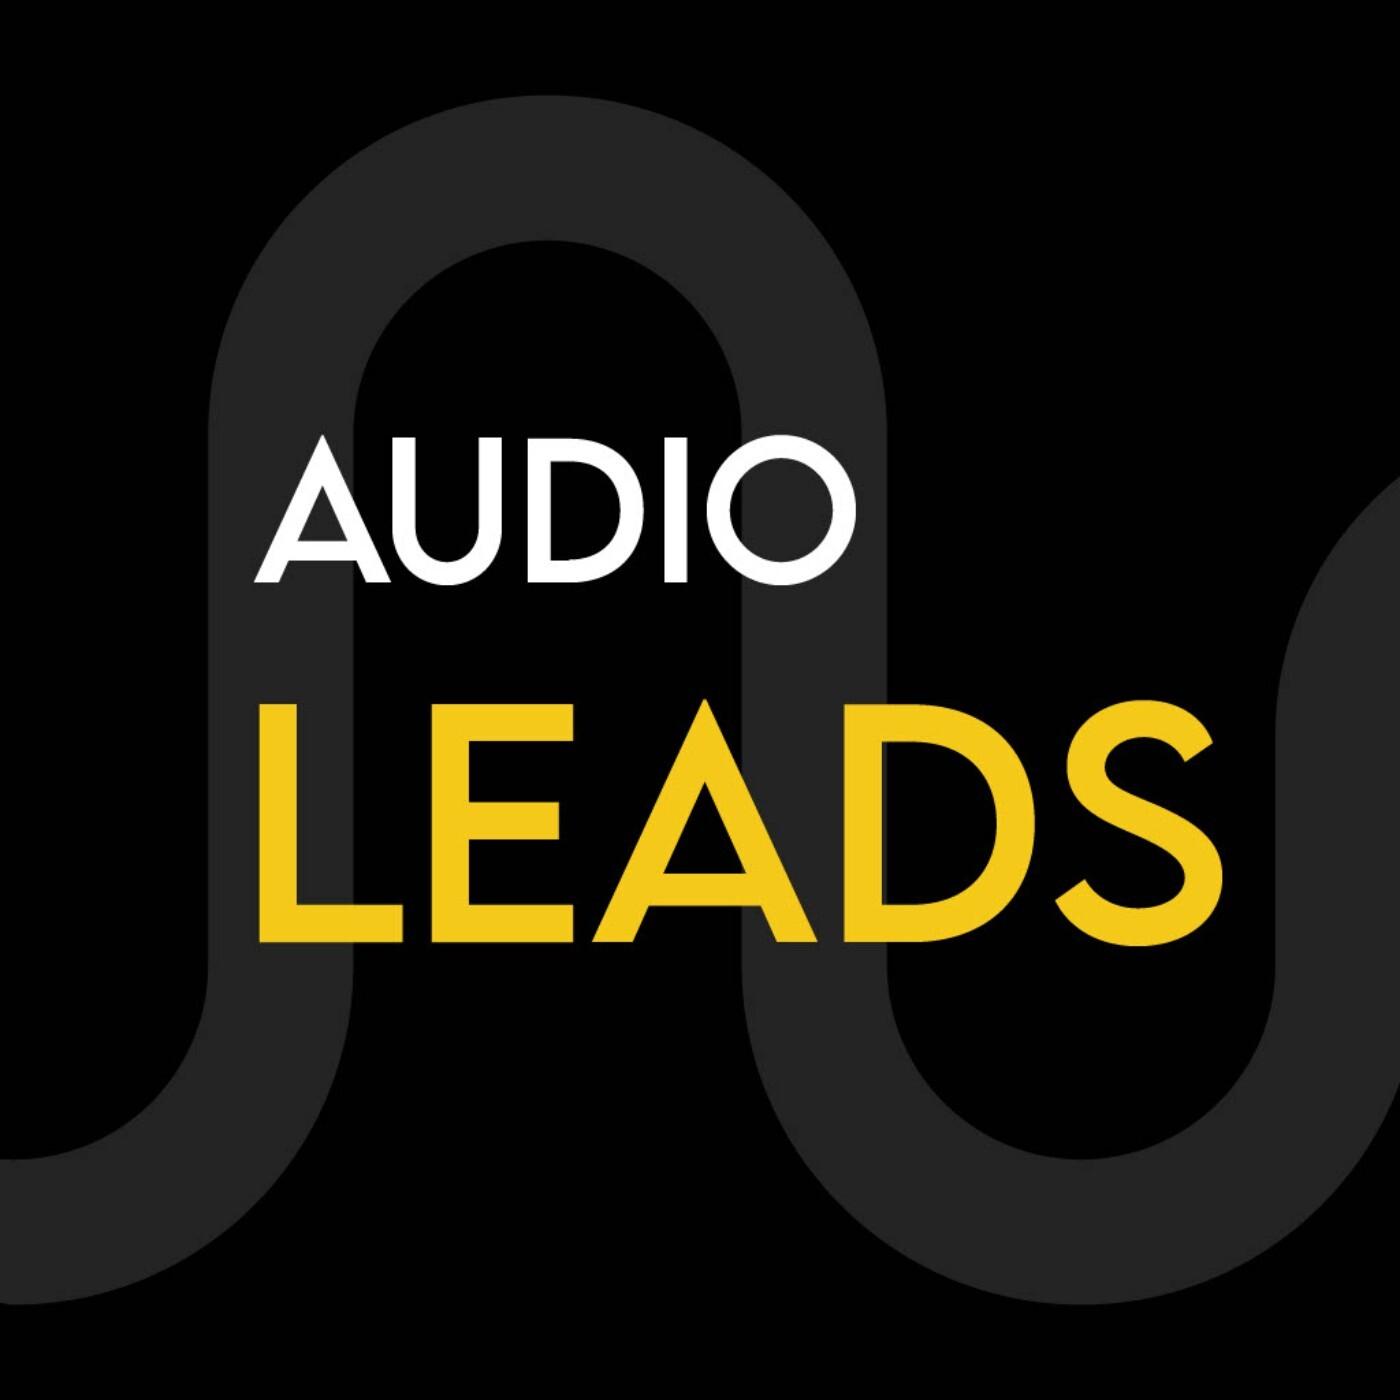 Audio Leads